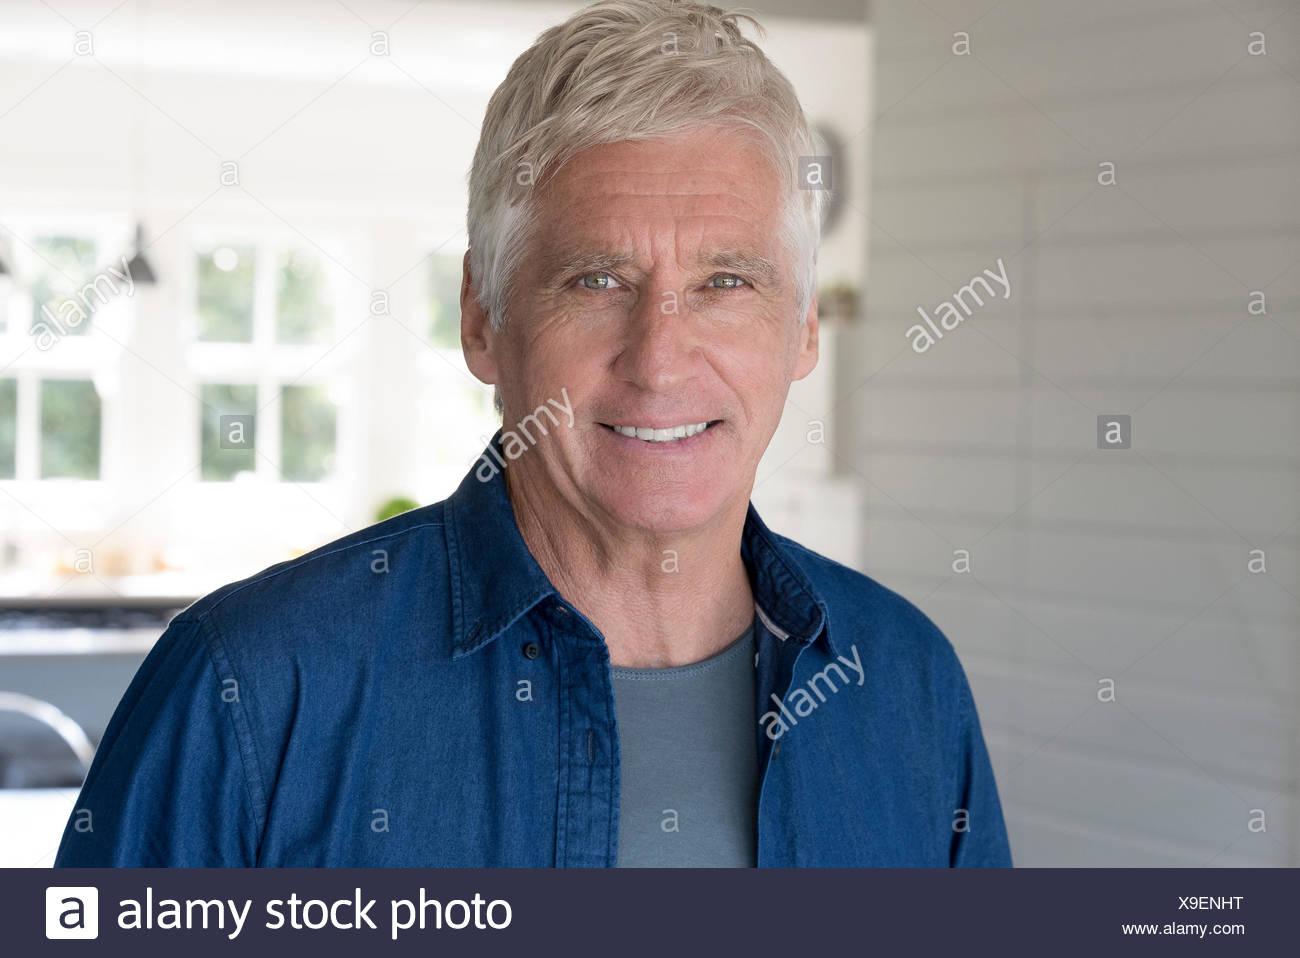 Portrait of happy senior man smiling at home Photo Stock